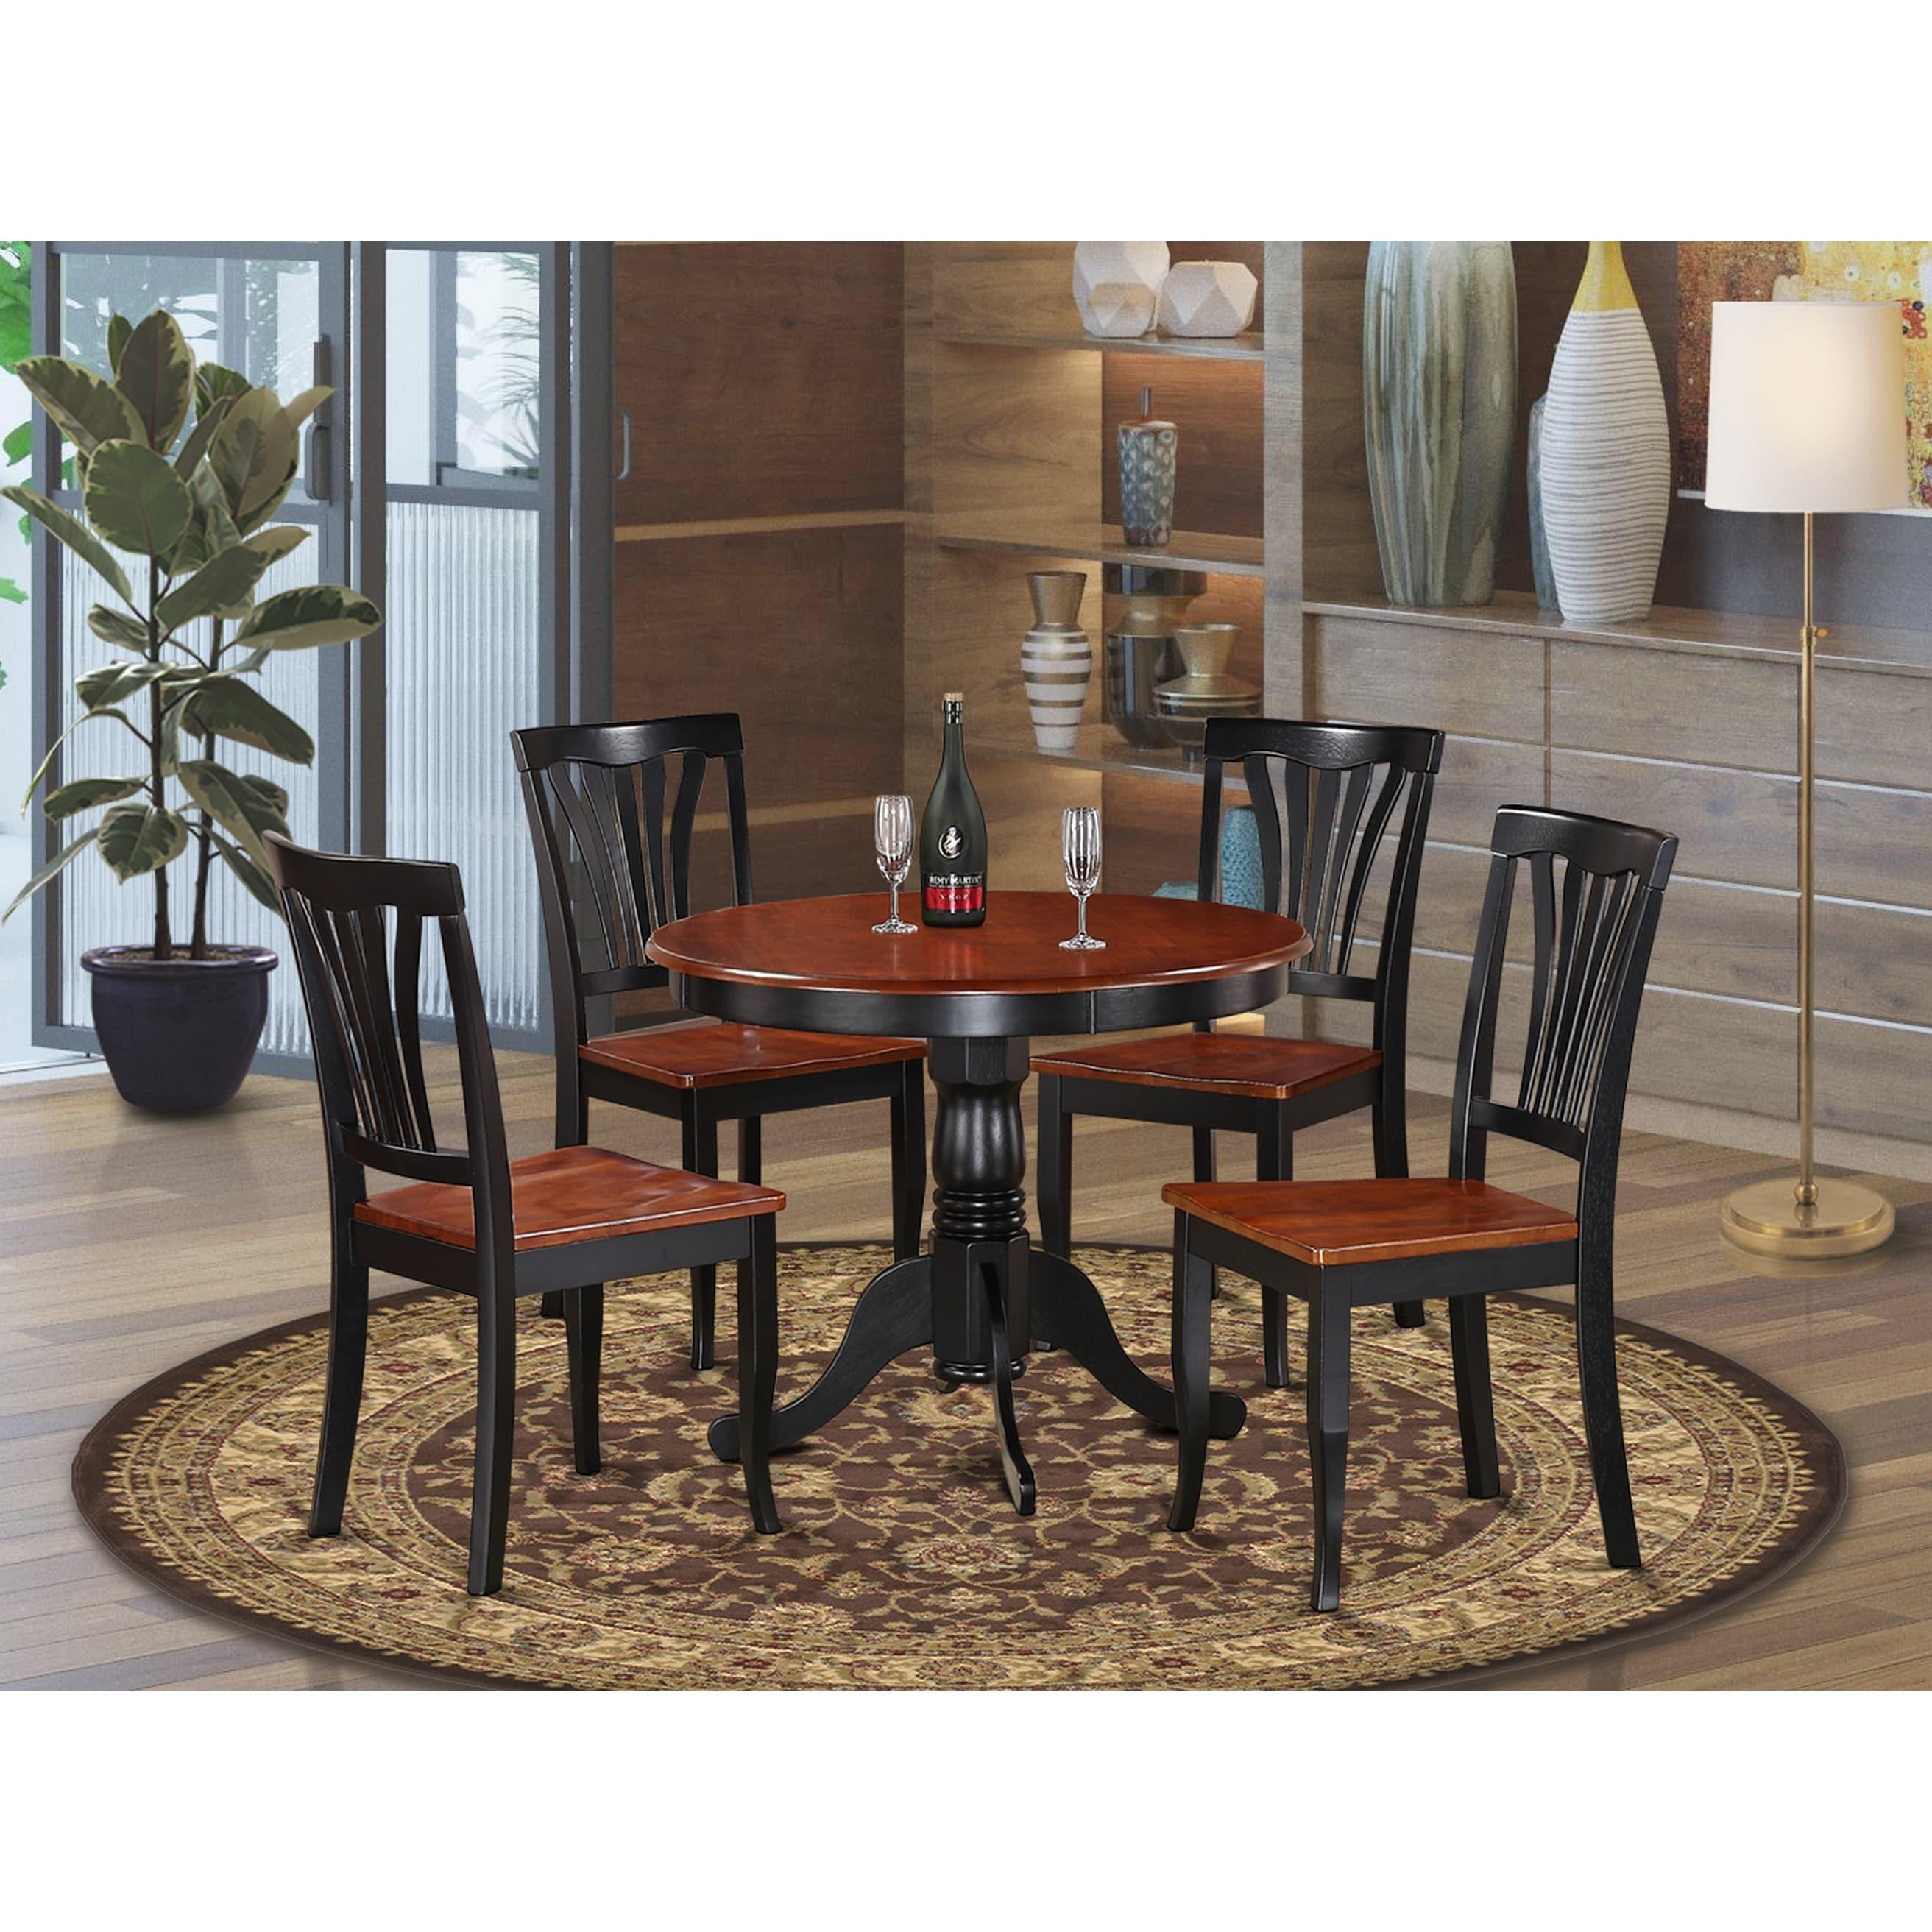 10-piece Round Black and Cherry Kitchen Table Set